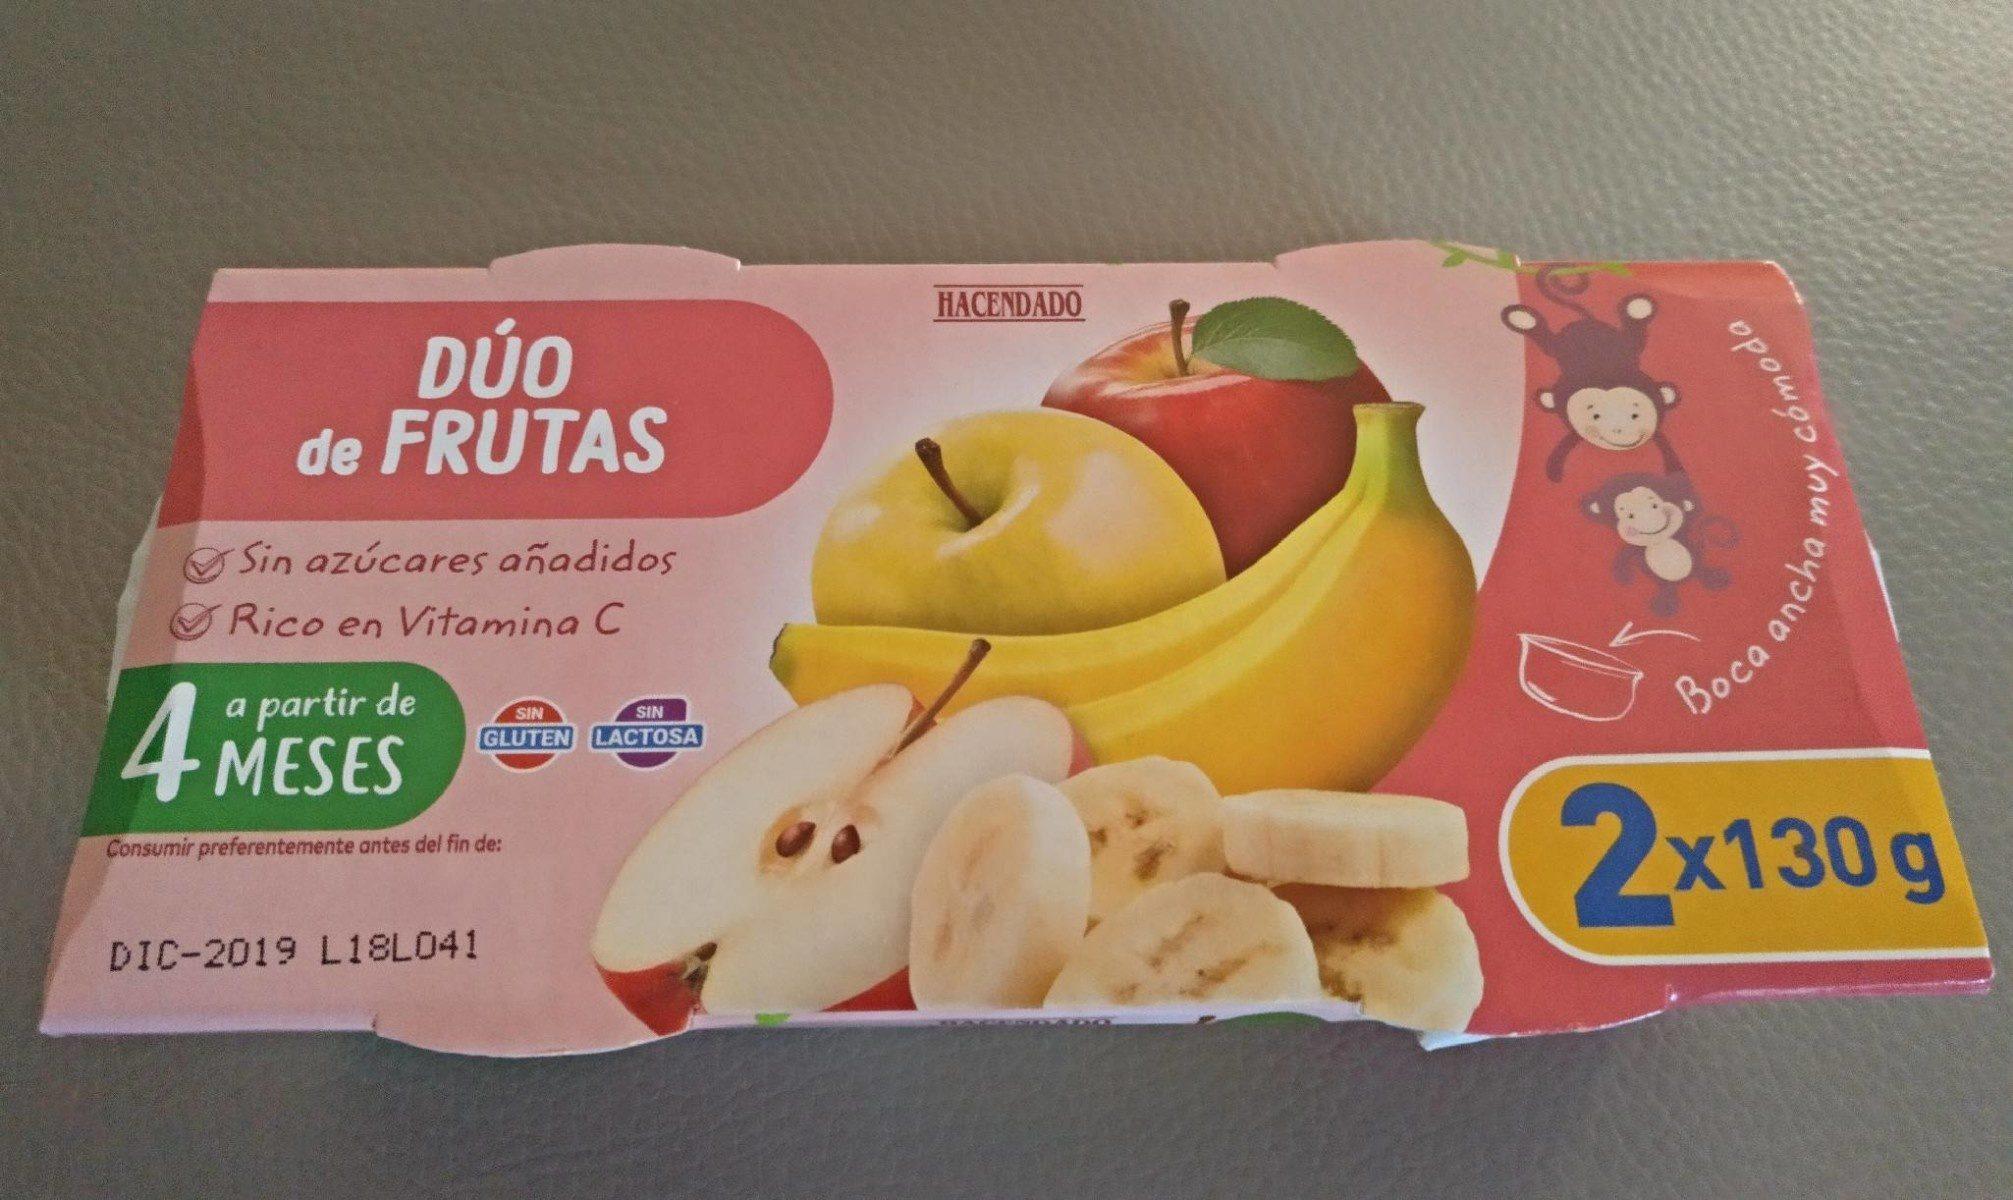 Duo de Frutas - Product